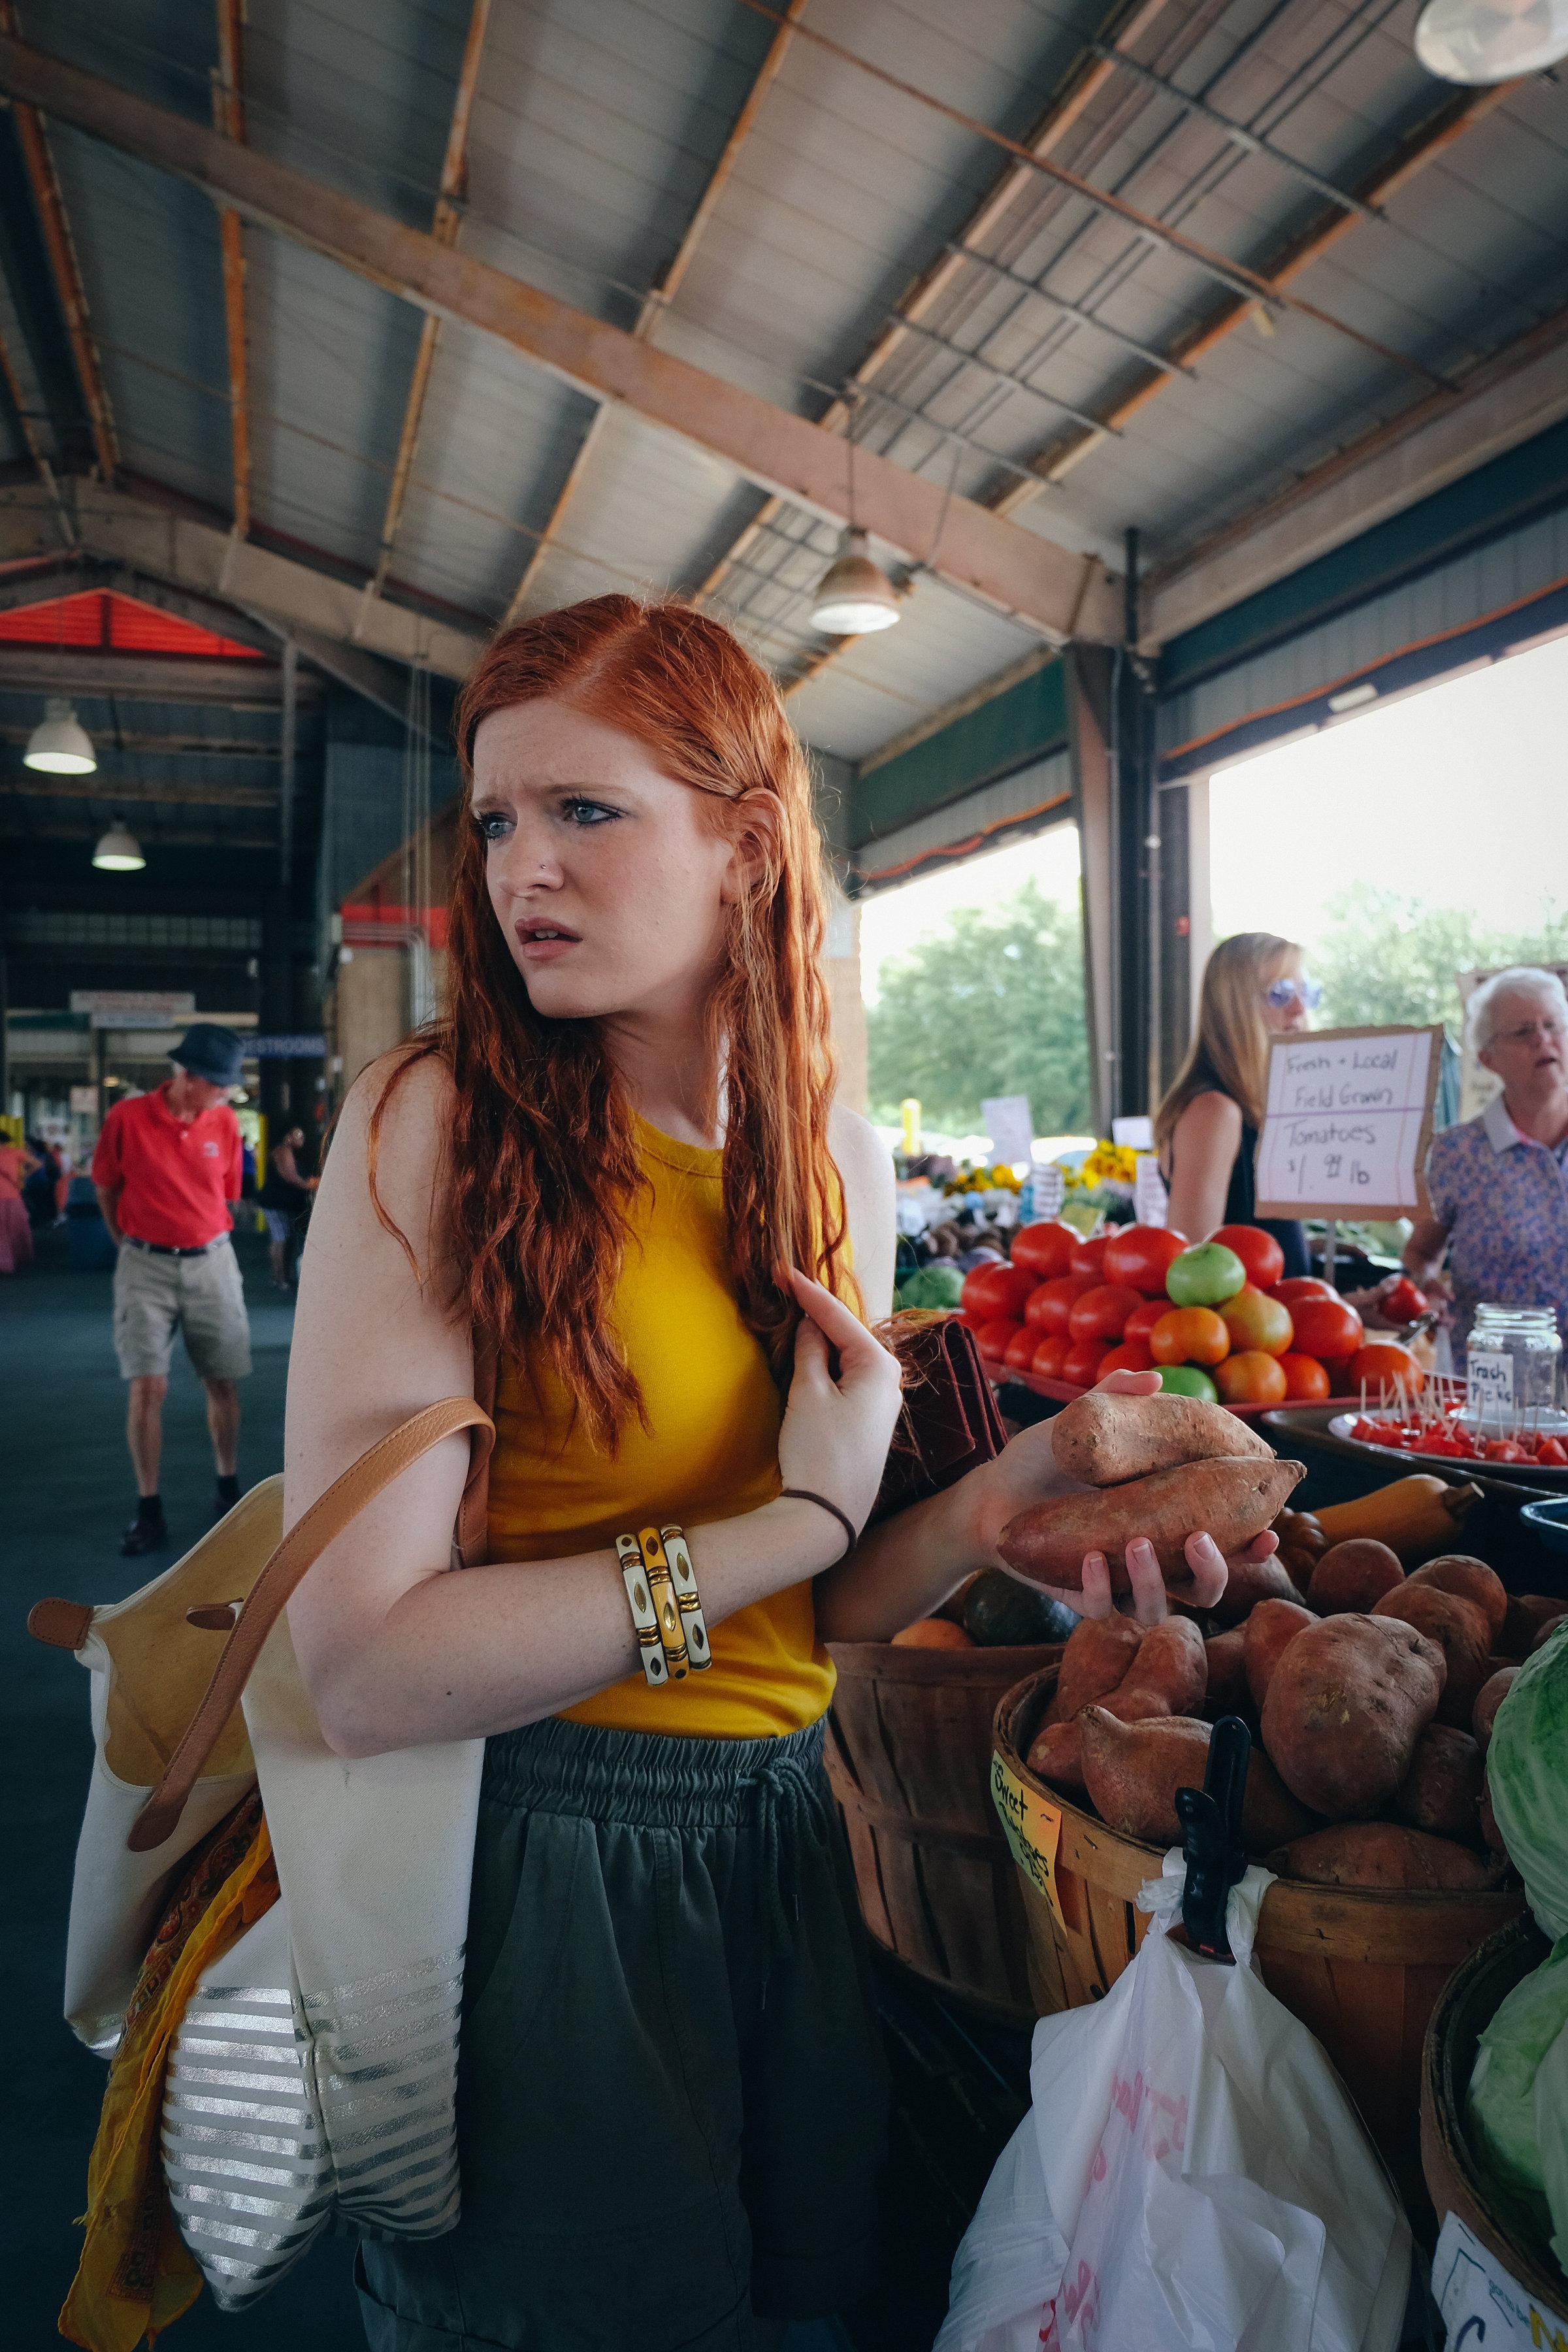 North Carolina State Farmer's Market - State Farmer's Market - Farm to Table Movement - Raleigh Lifestyle Blogger - Organic